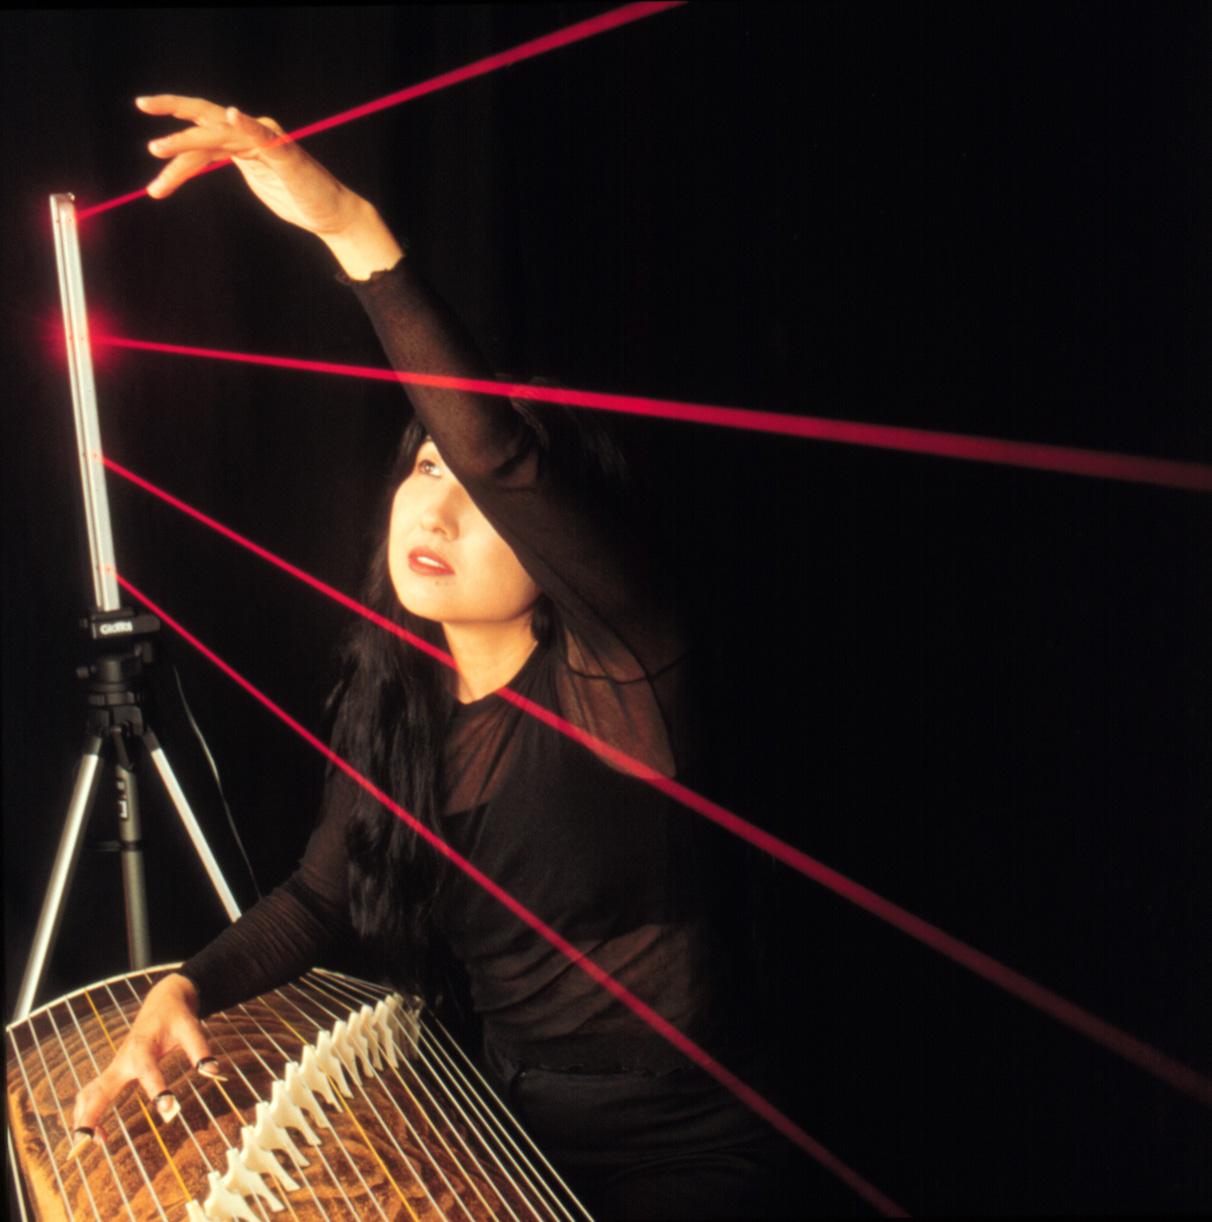 Miya Masaoka